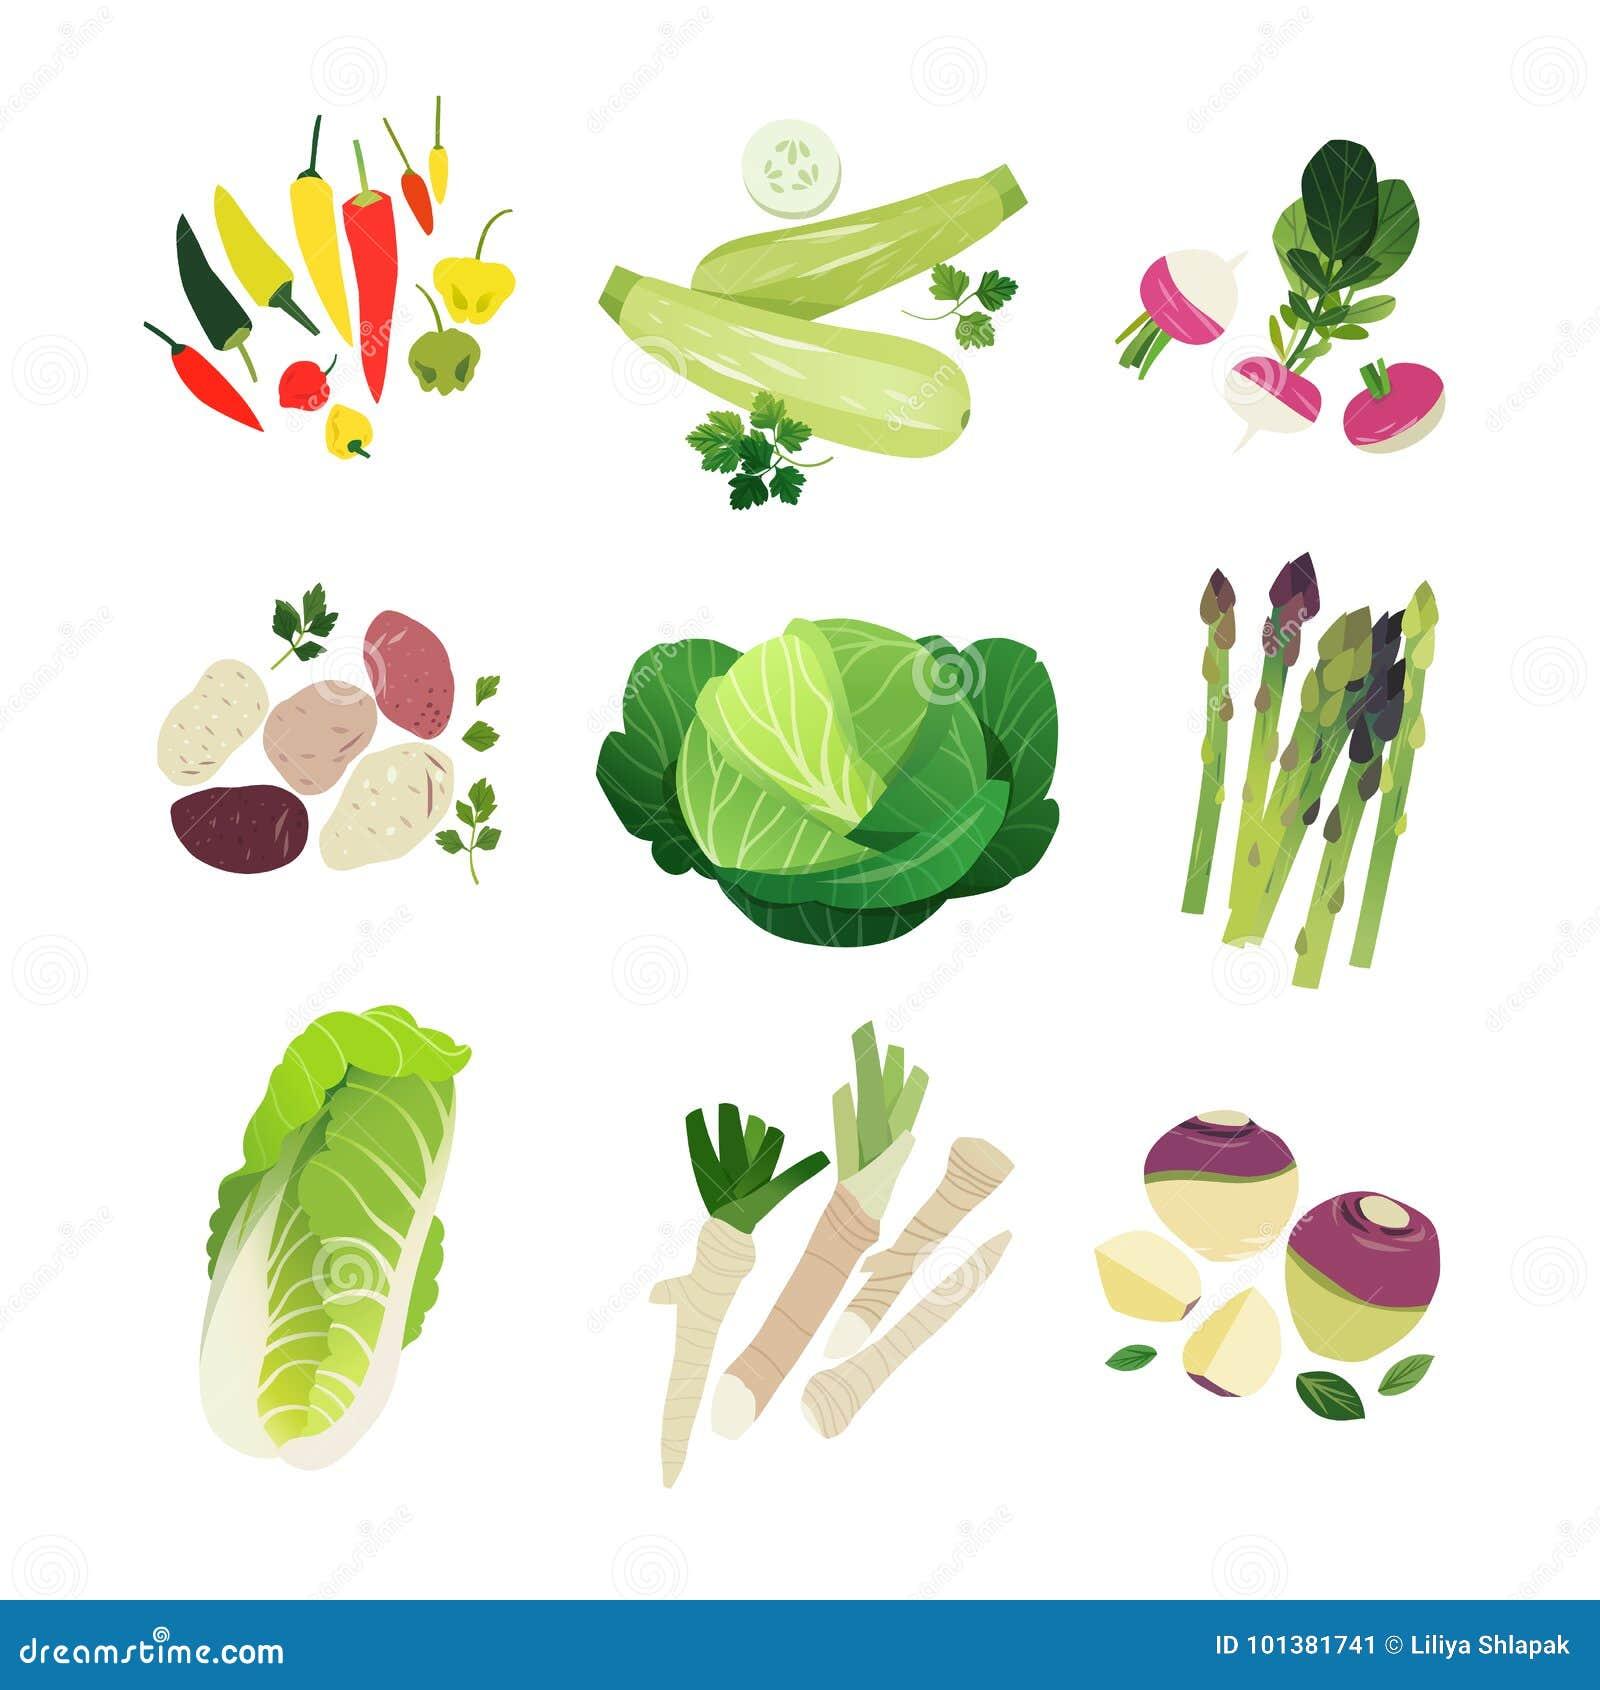 Clip art vegetables set